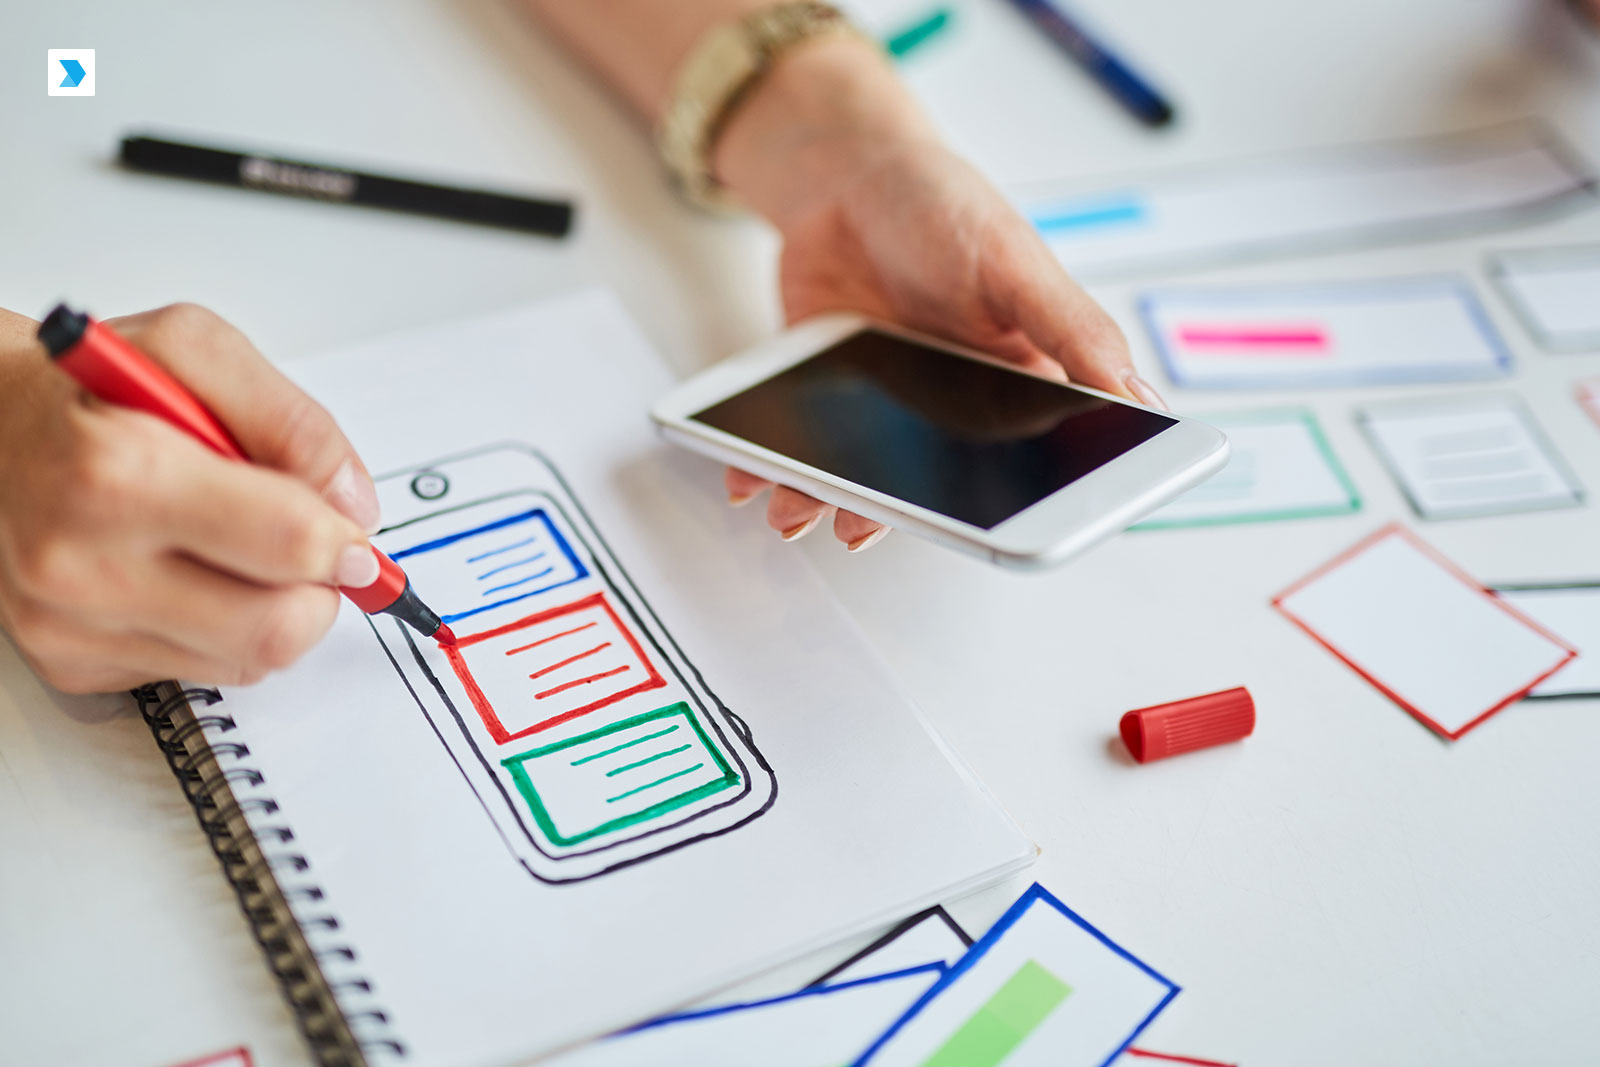 11-Web-Design-Trends-to-Watch-in-2018.jpg